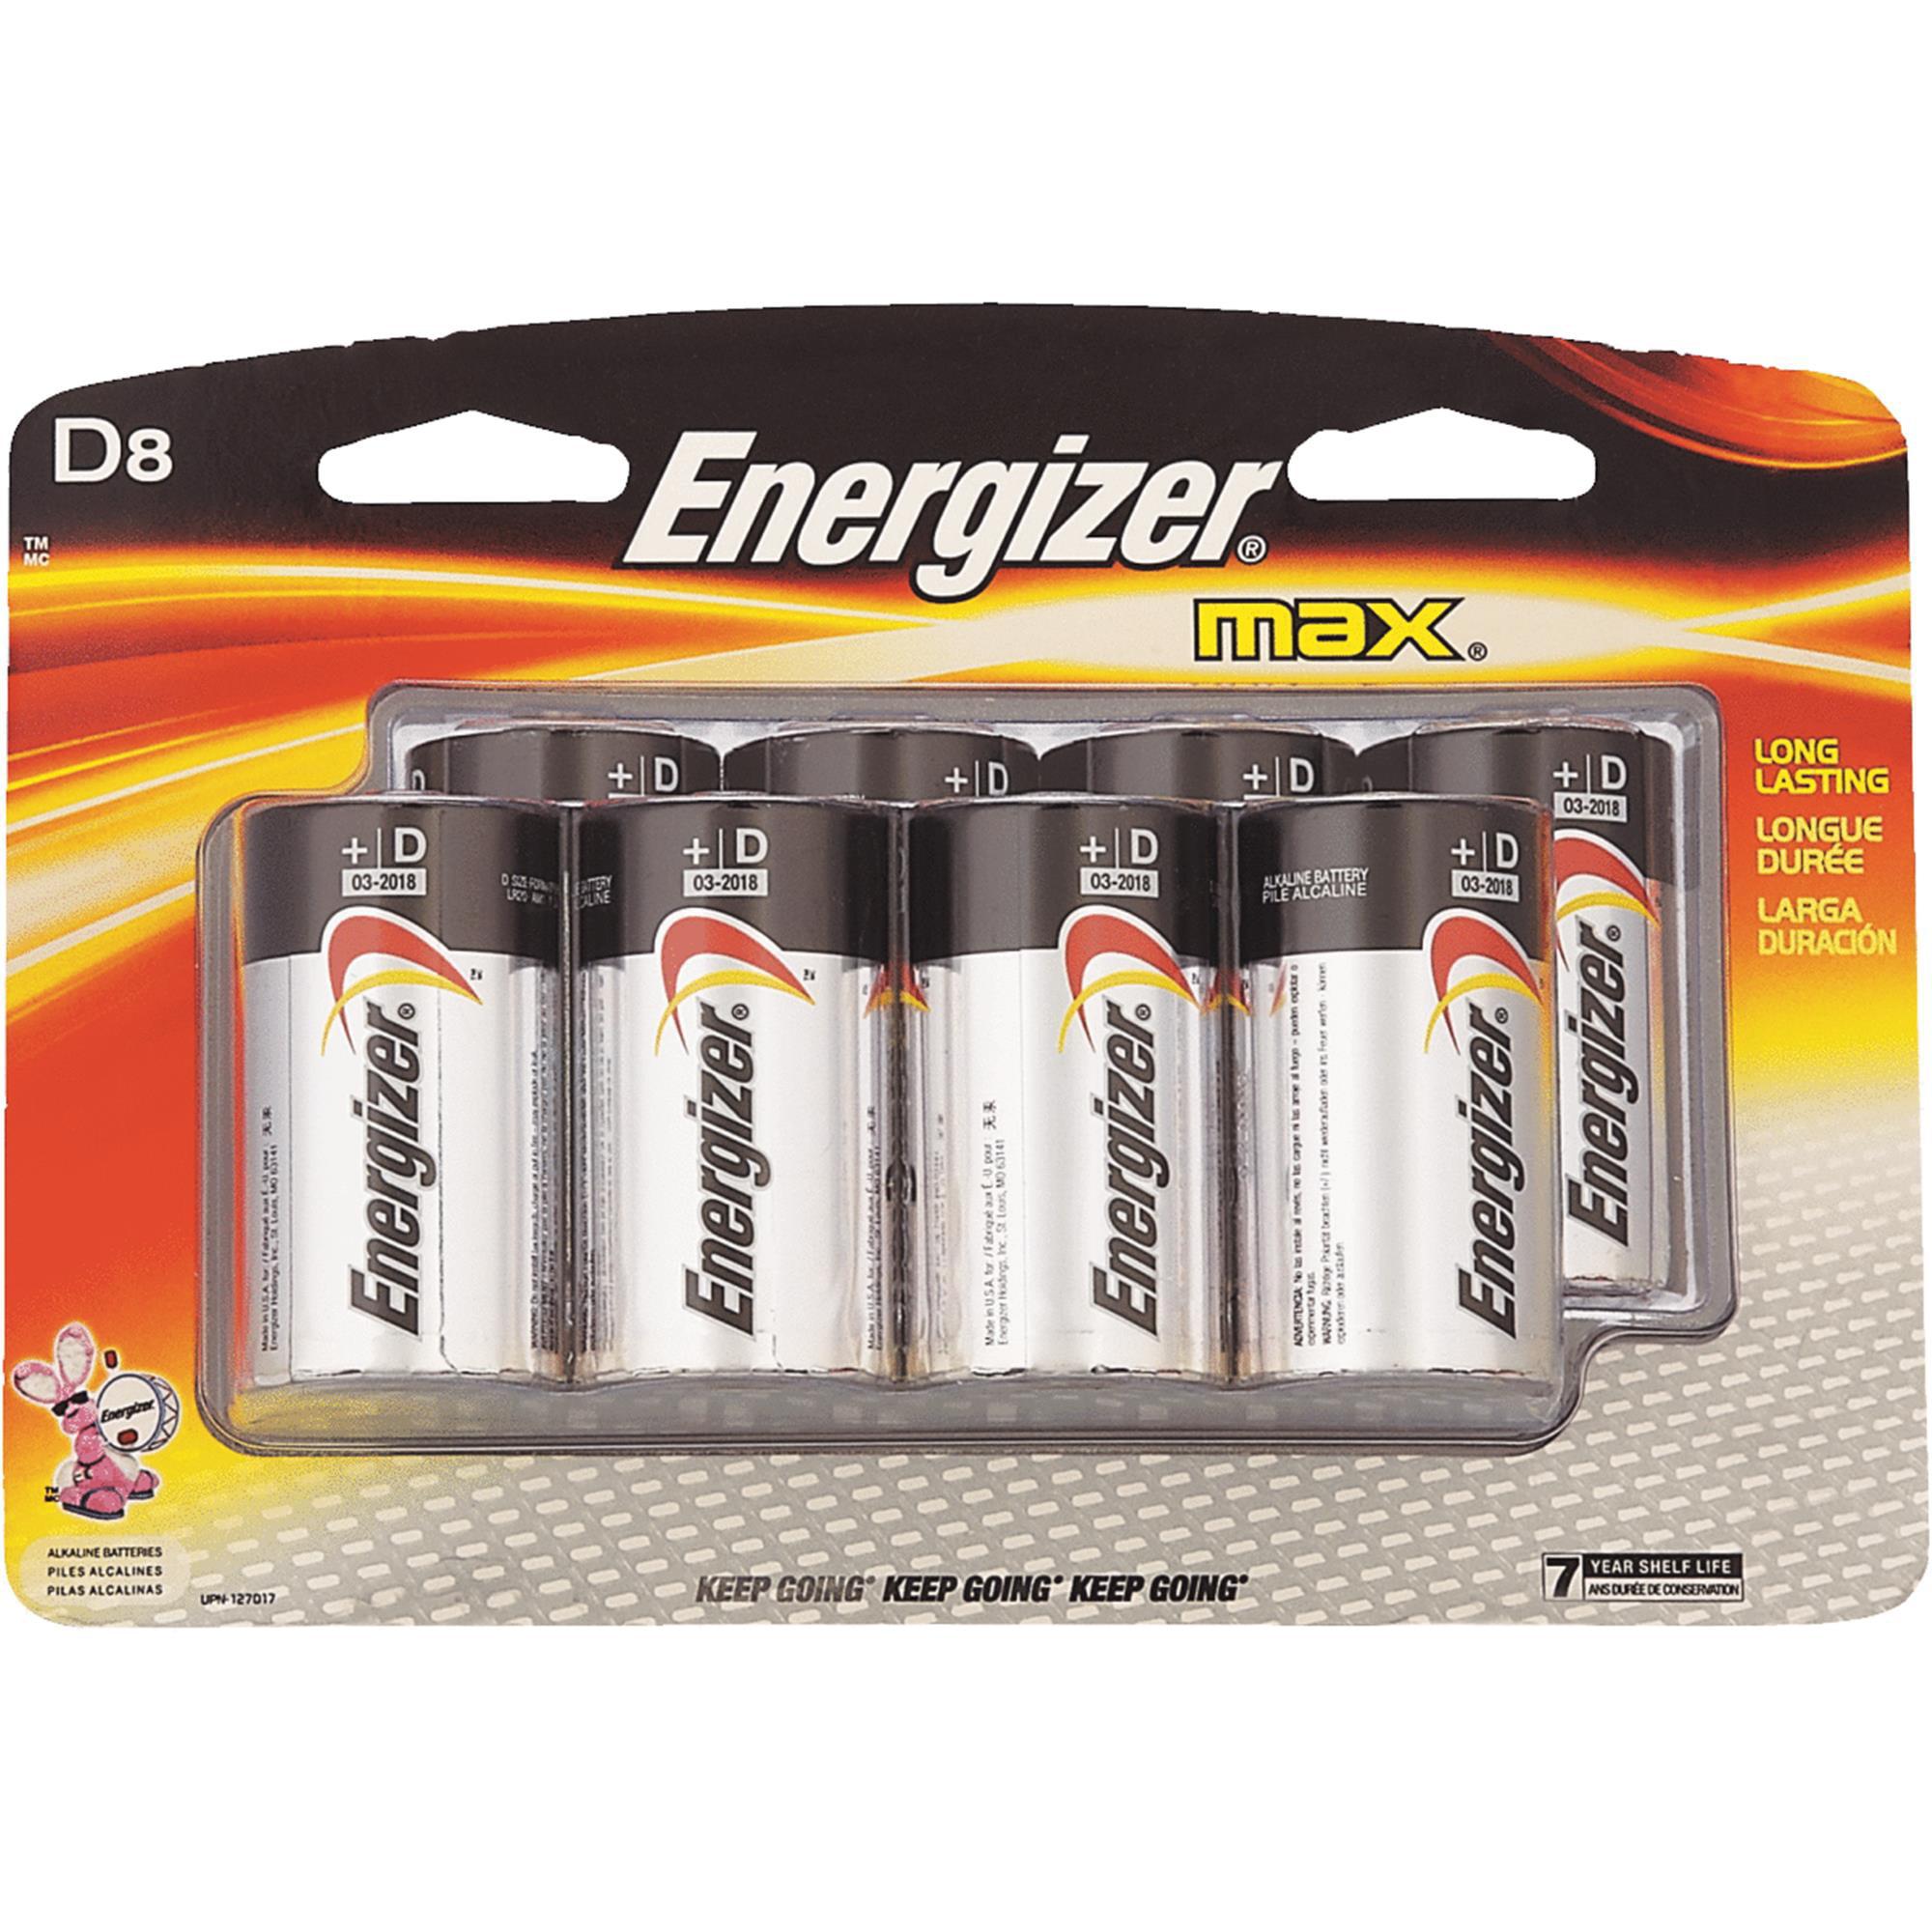 Energizer Max D Alkaline Battery